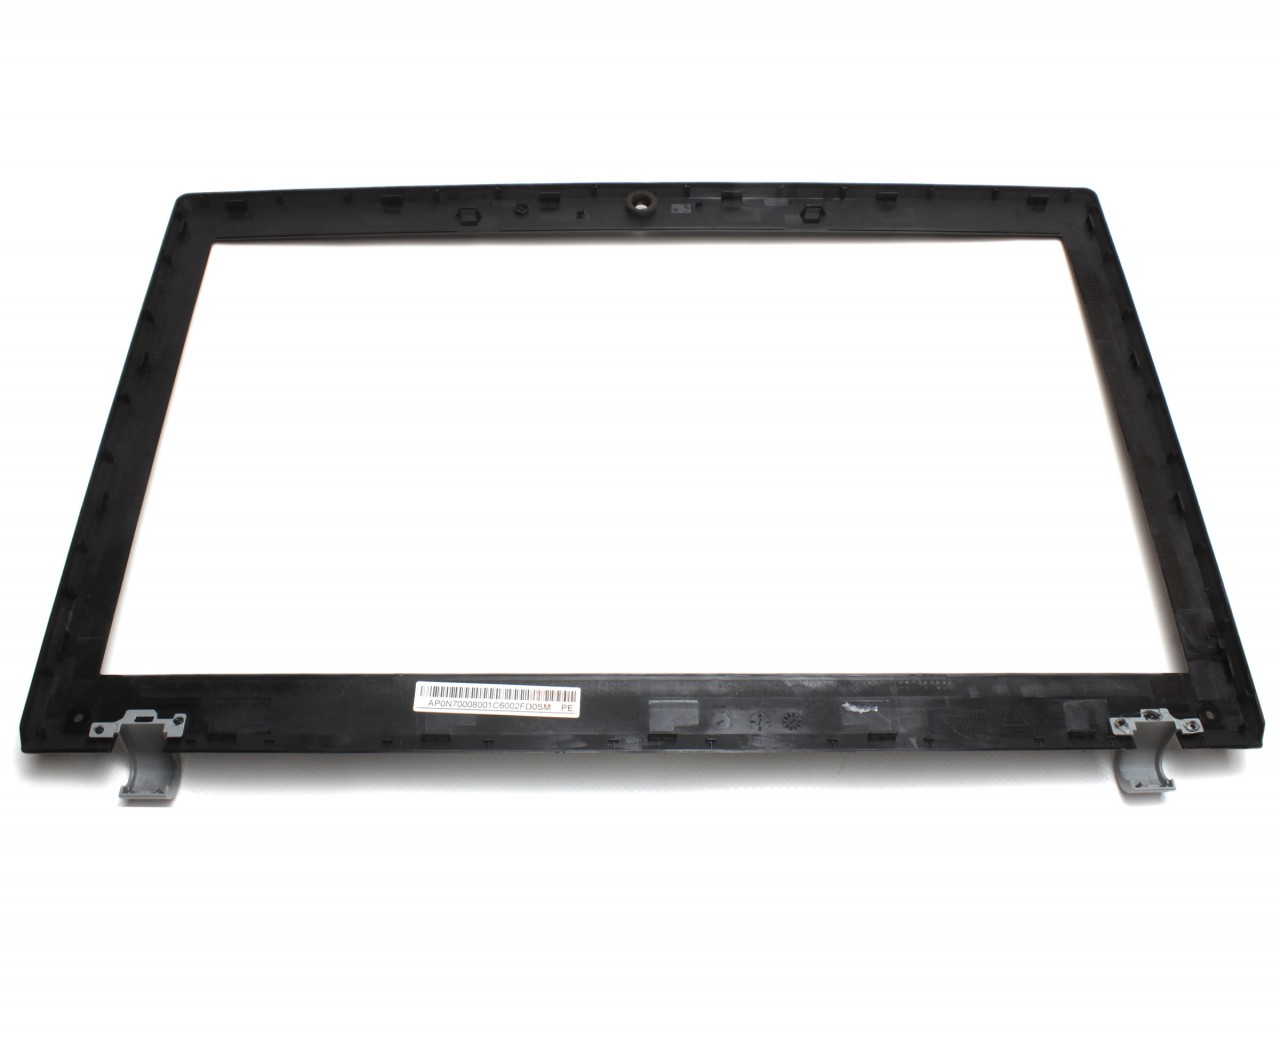 Rama Display Acer Aspire V3 571G Bezel Front Cover Neagra imagine